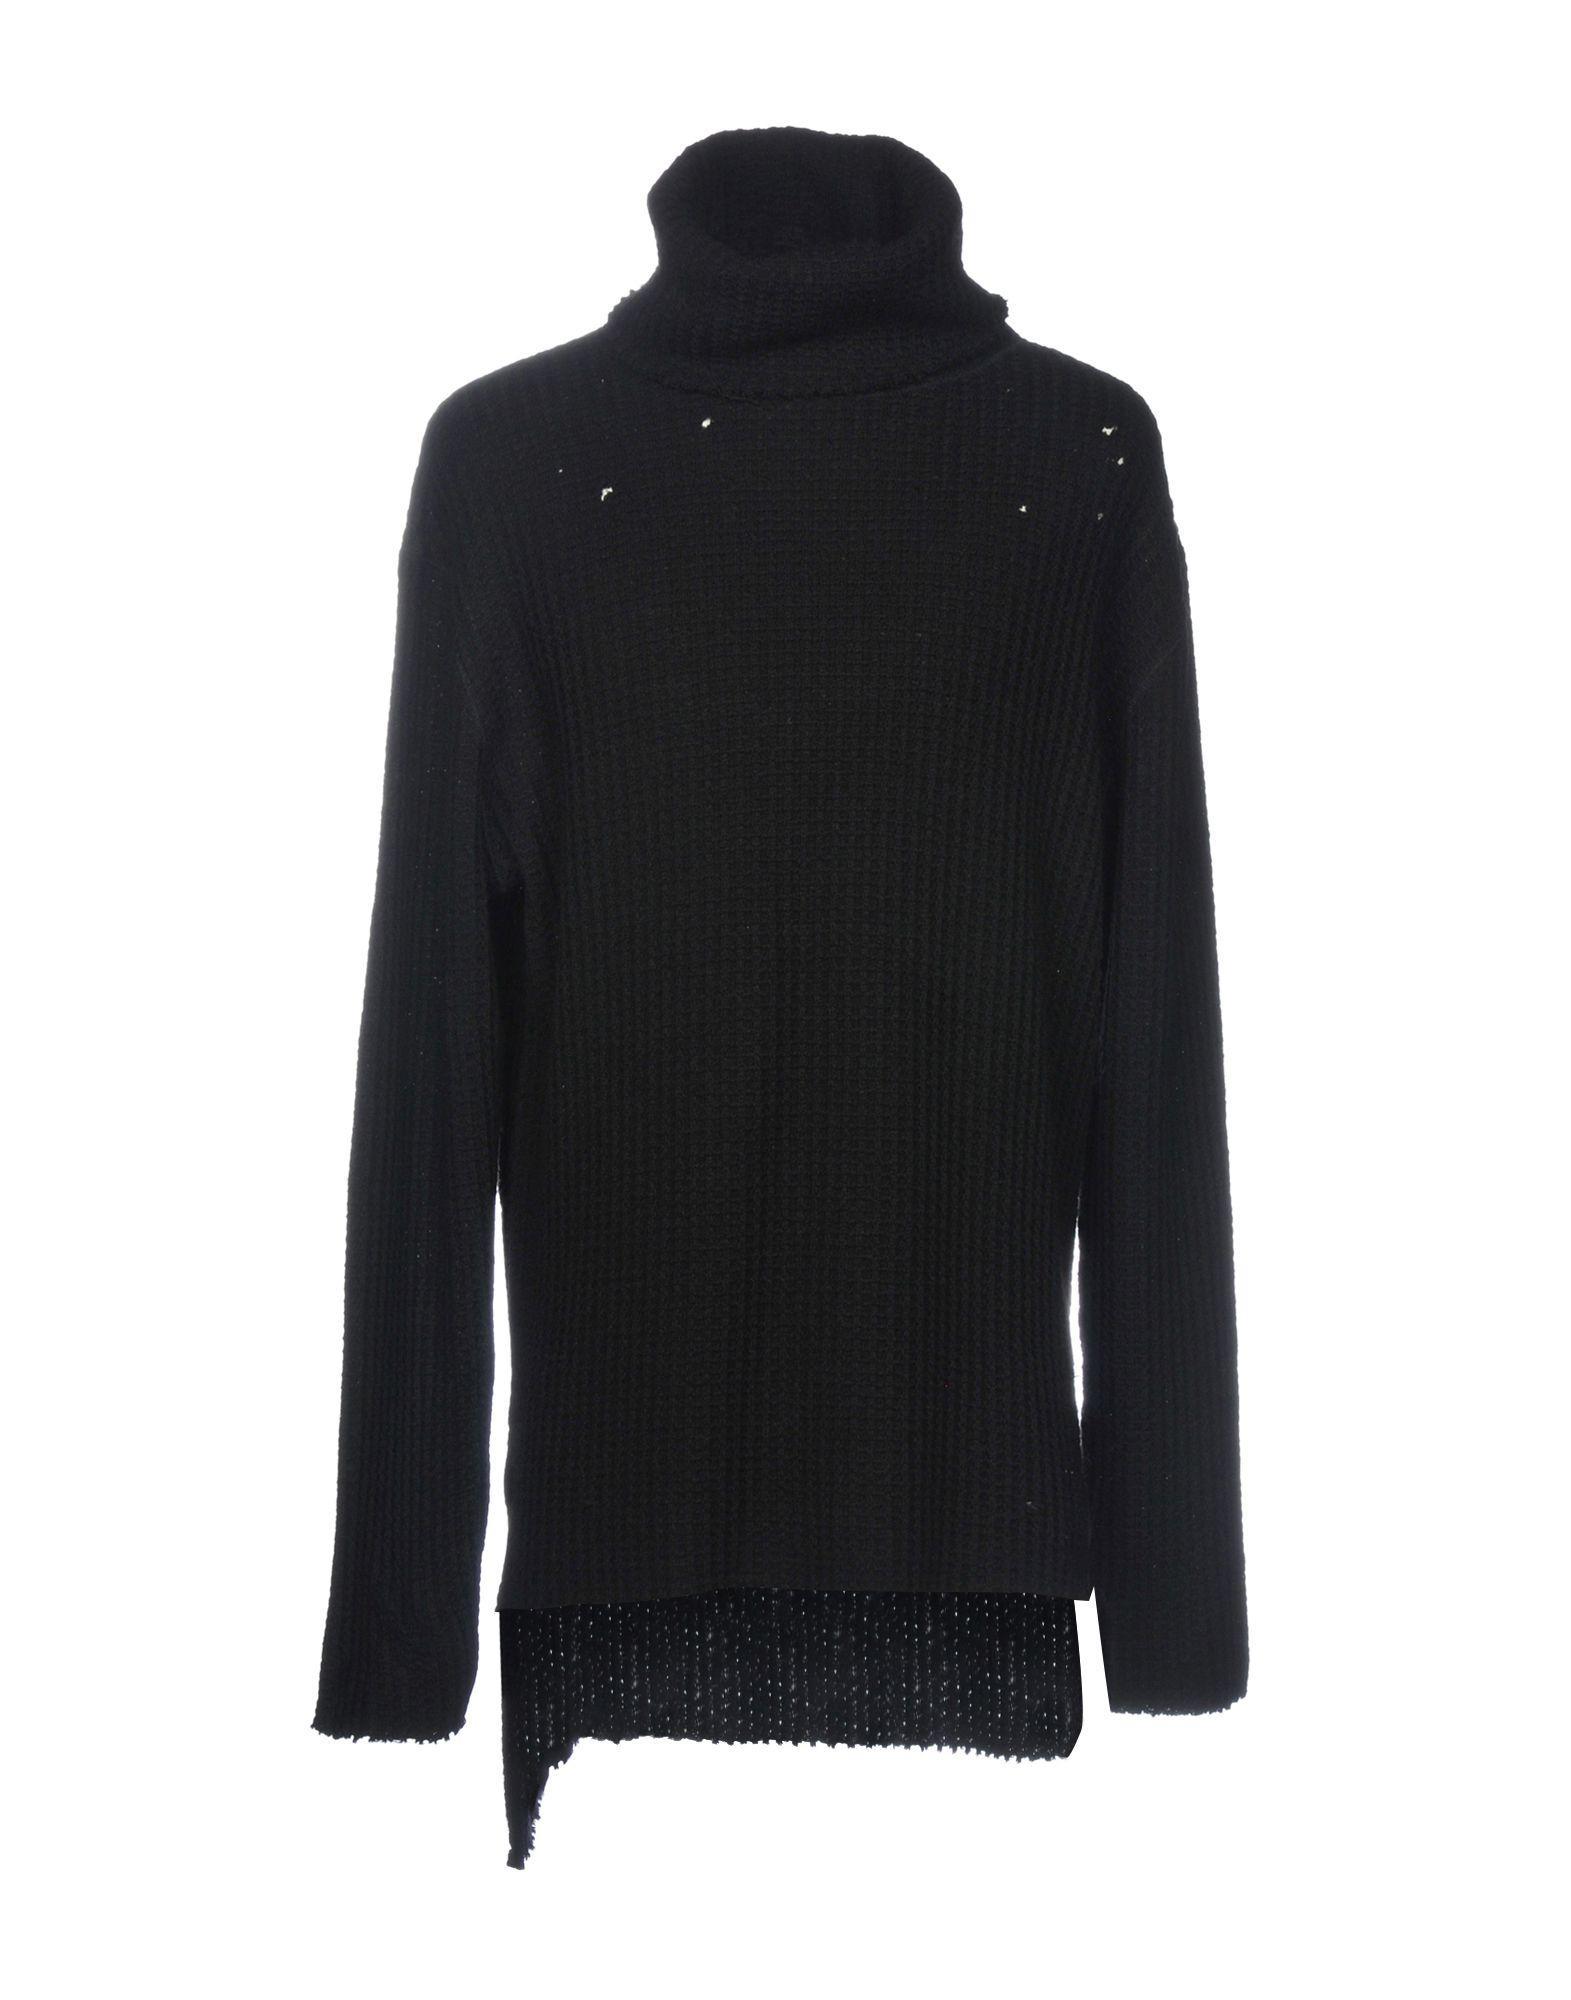 Miharayasuhiro Turtleneck In Black